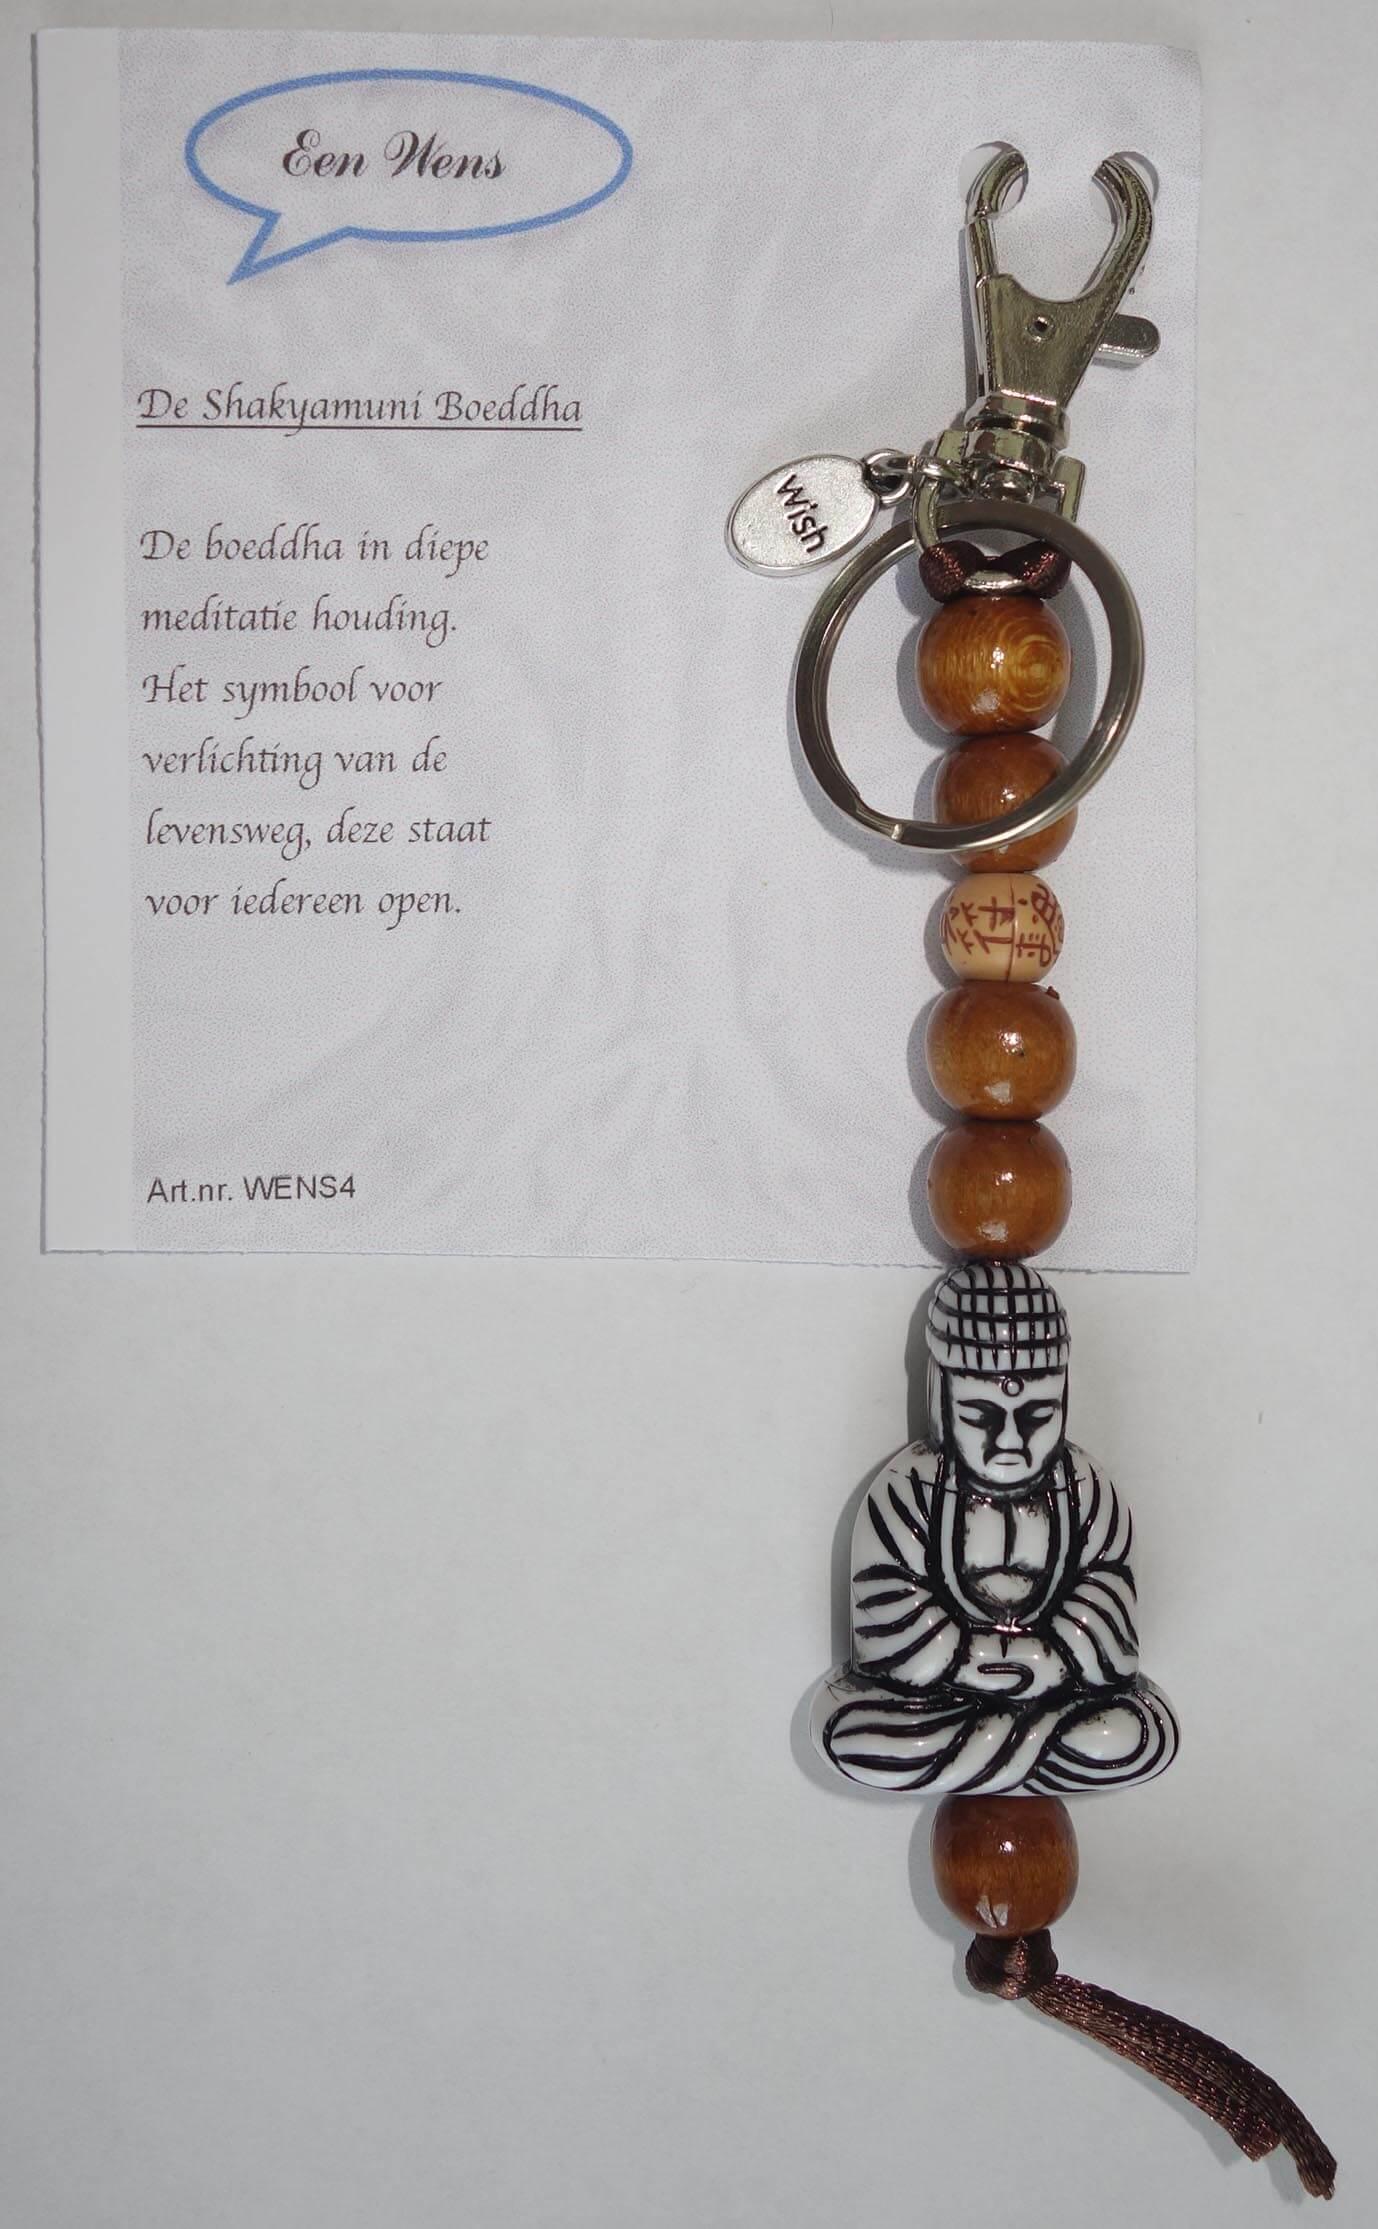 De Shakyamuni Boeddha Sleutelhanger Zwart/Wit-0